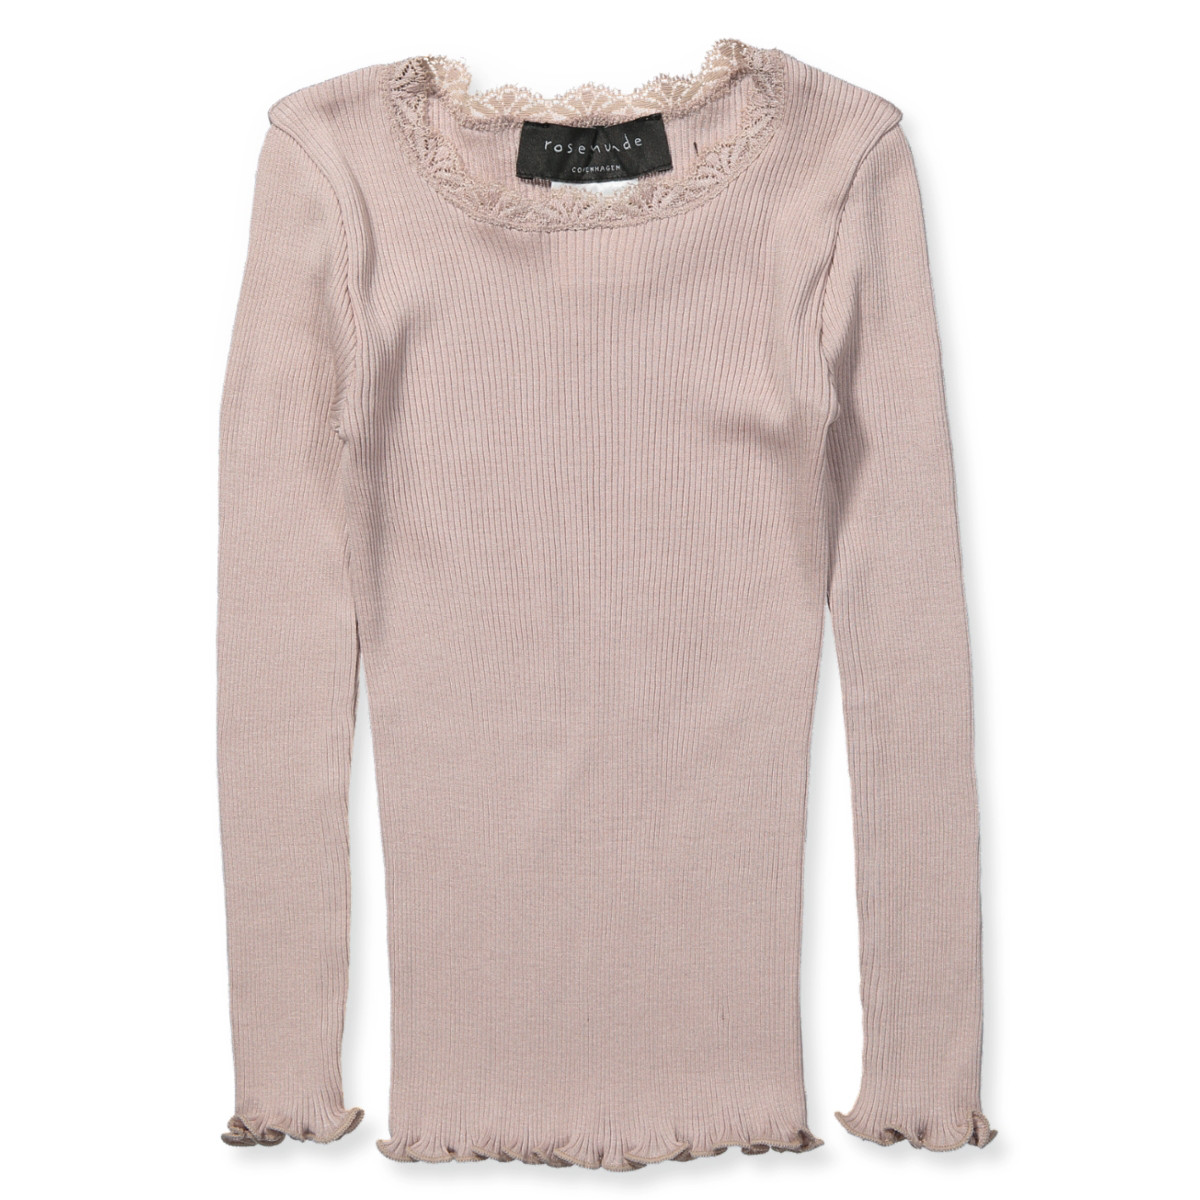 30abc15fef16dc Rosemunde - Rose silk LS t-shirt - Rosa - House of Kids